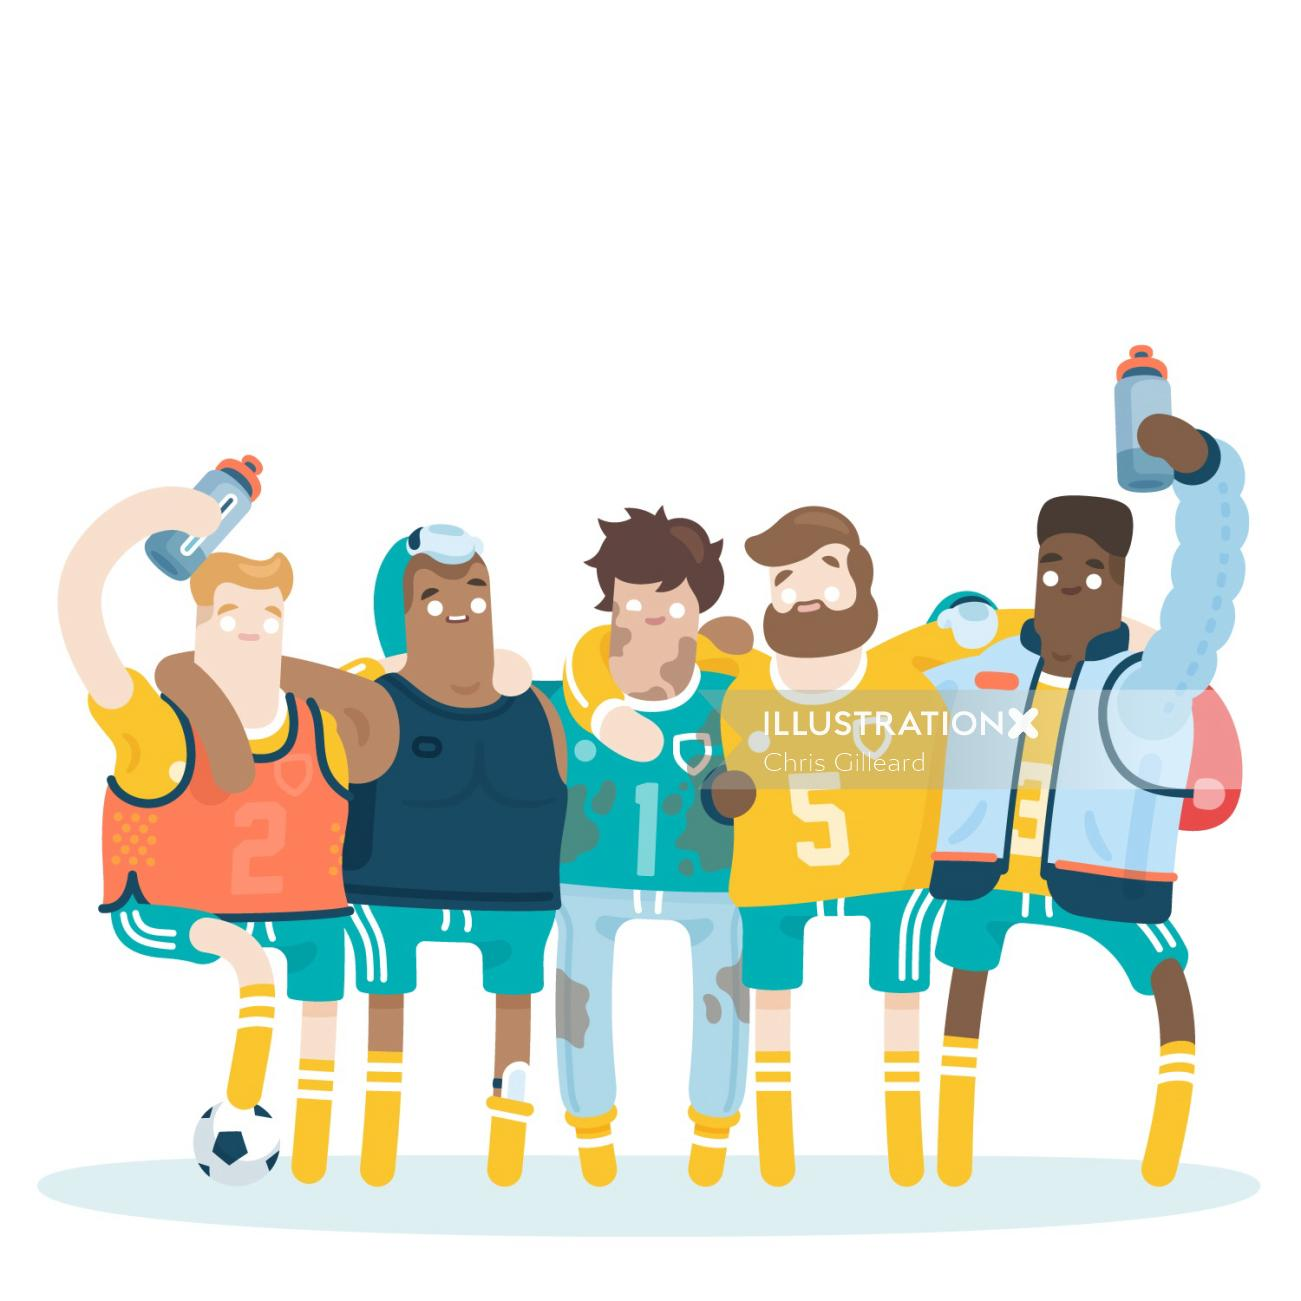 Teamwork sport person illustration by Chris Gilleard